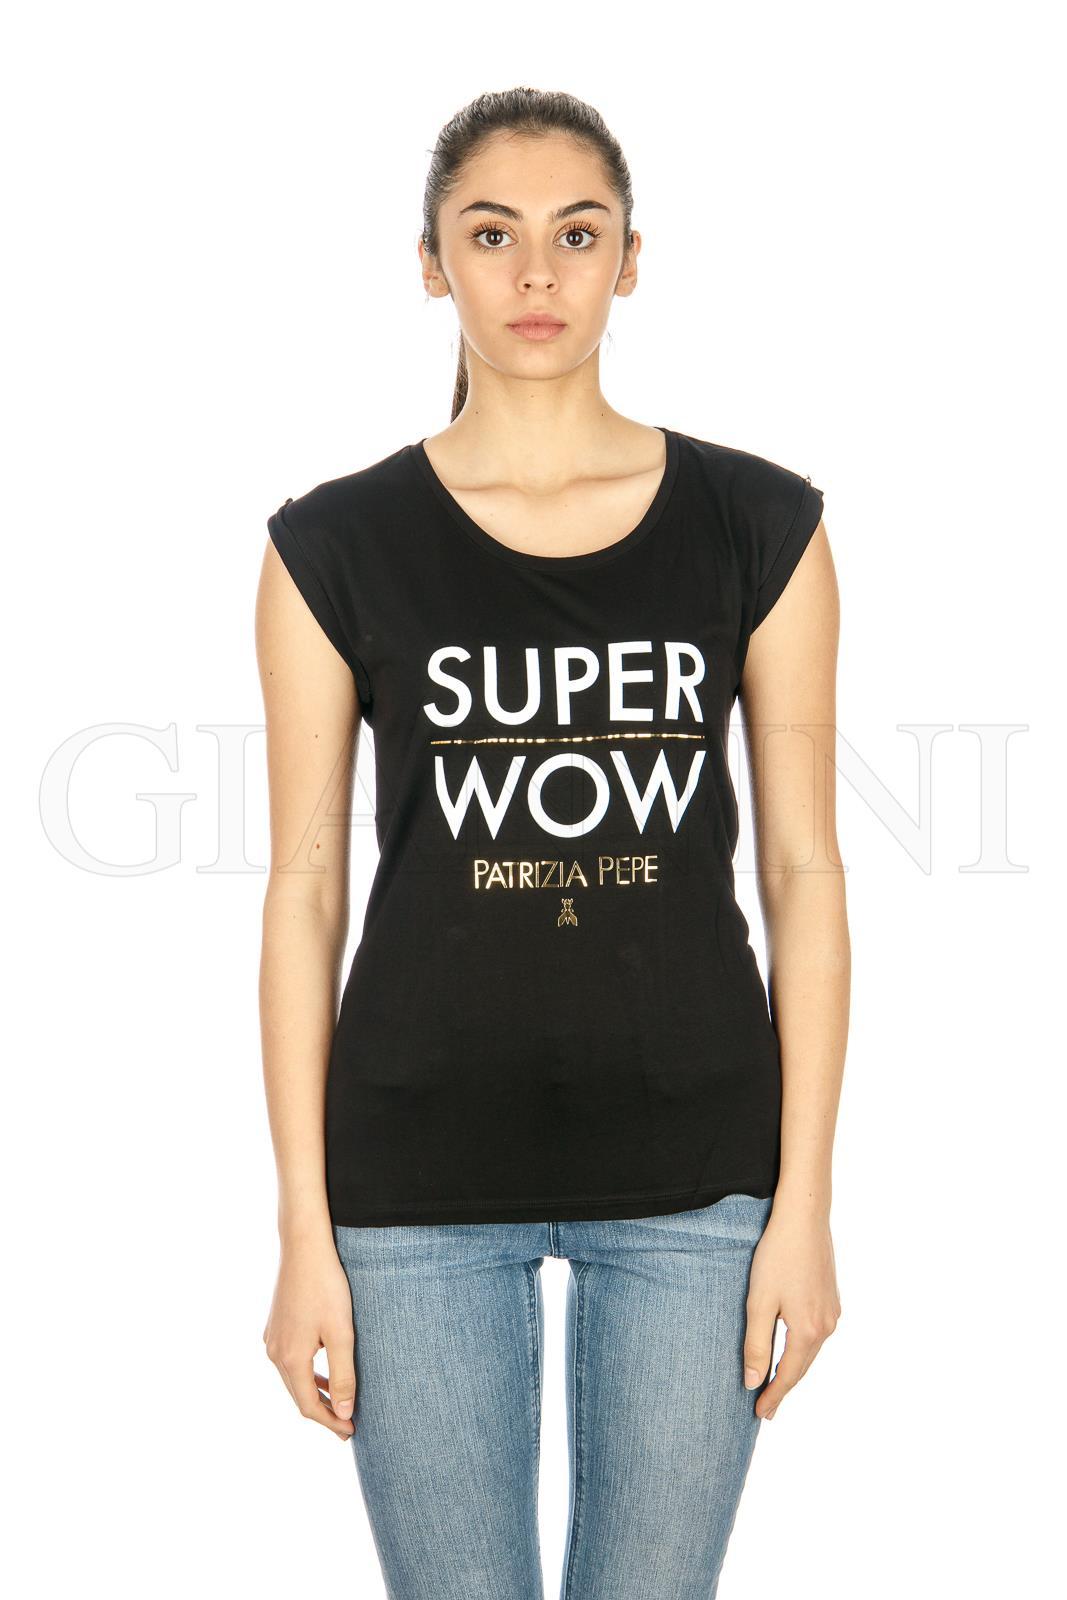 online store 2b8b7 f3307 Patrizia Pepe T-shirt